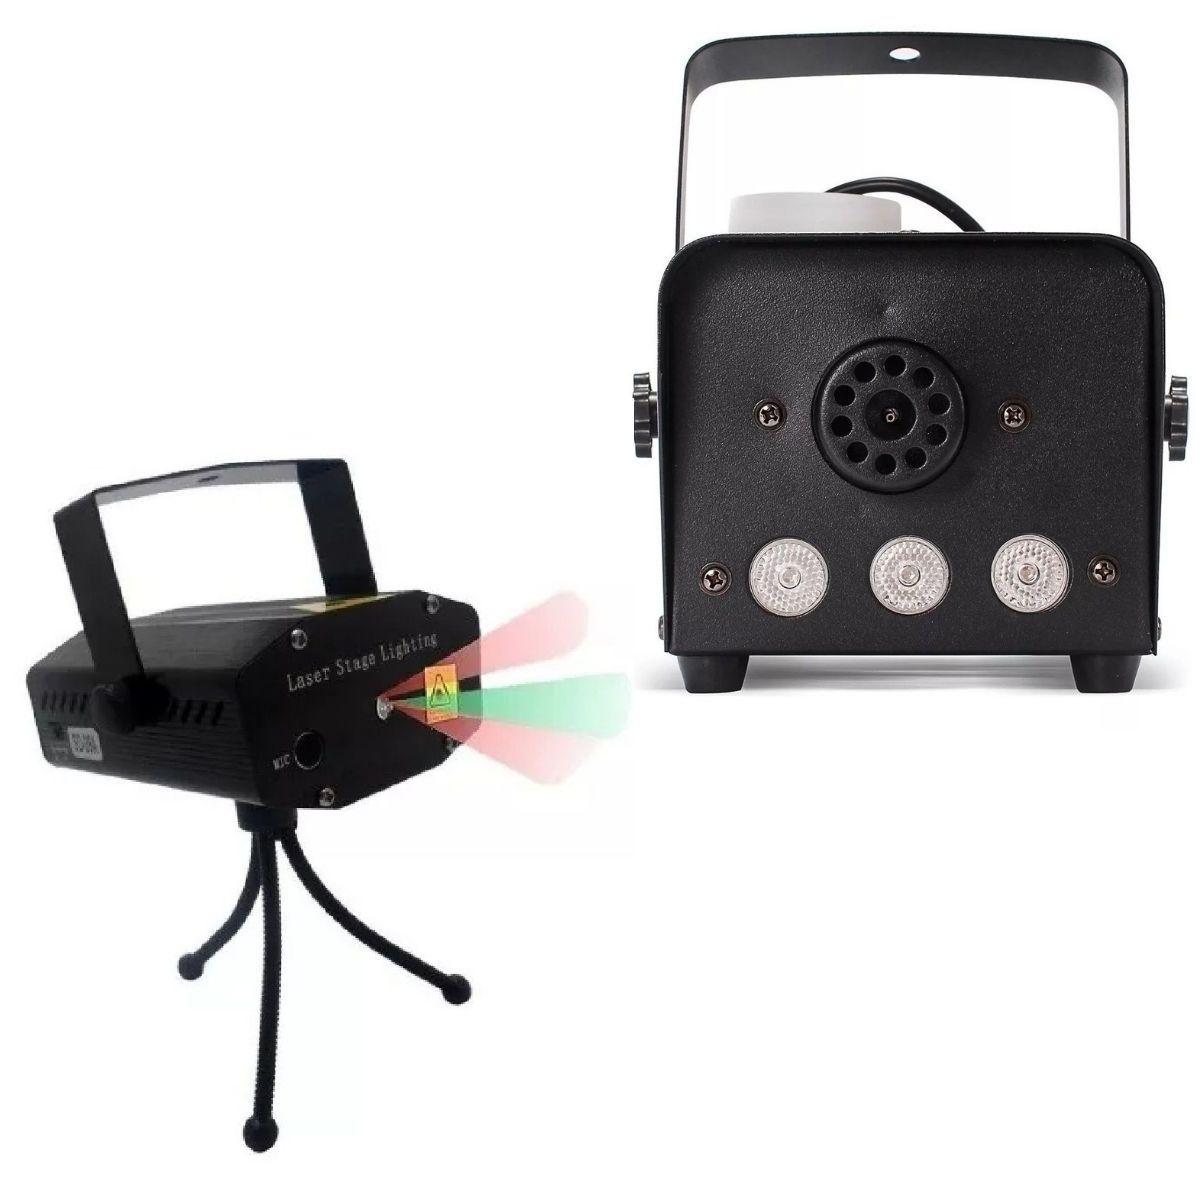 Kit Com Mini Projetor Holográfico E Maquina De Fumaça Profissional Controle Sem Fio 600W